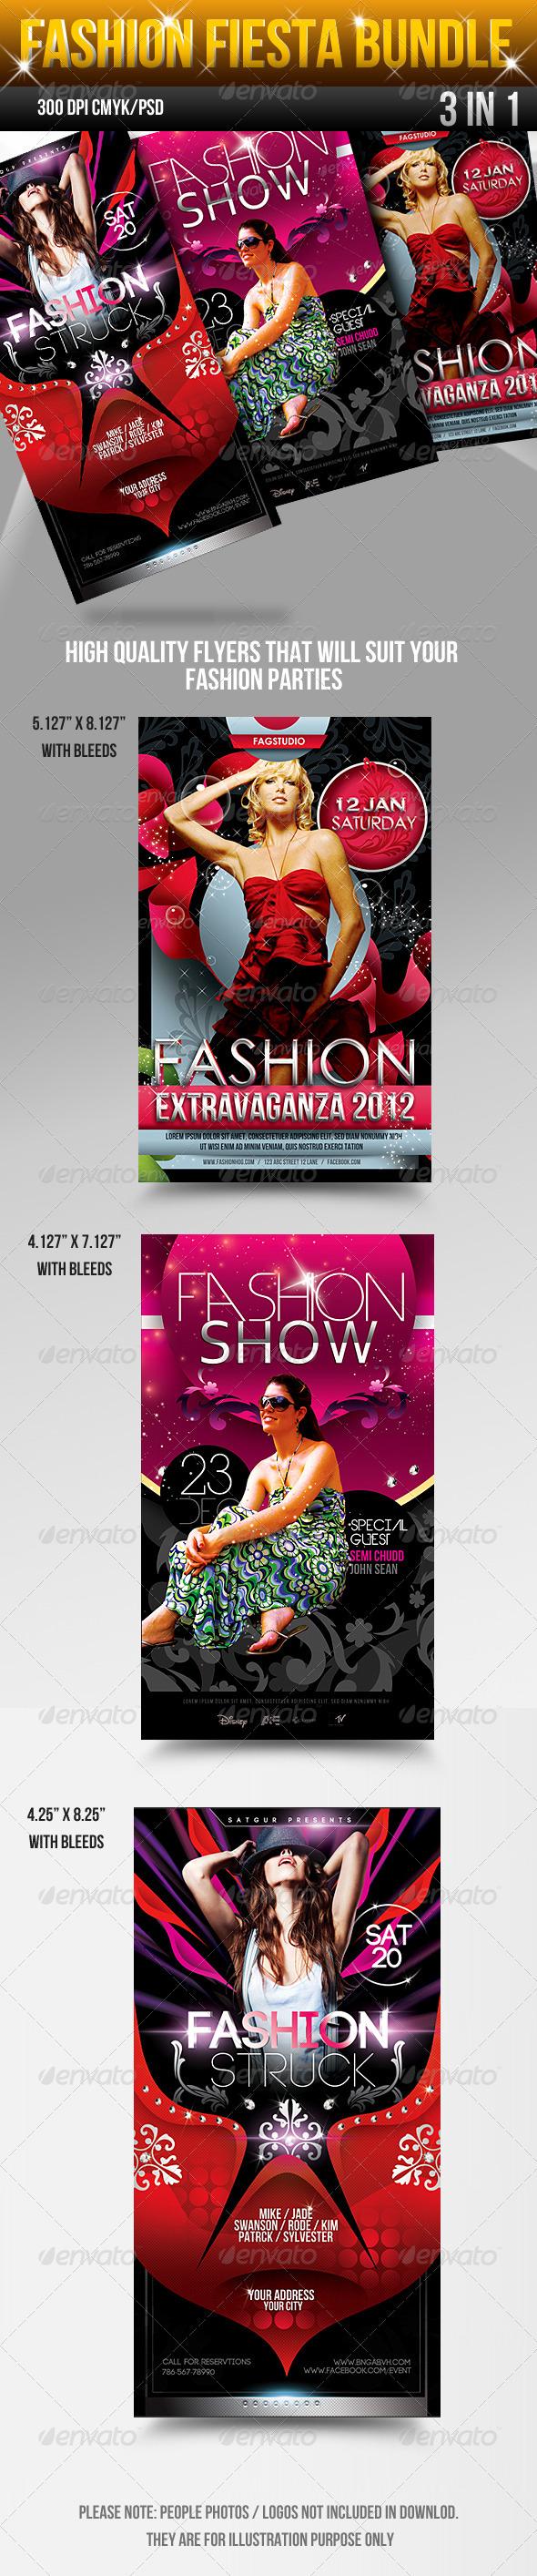 Fashion Fiesta Flyers Bundle - Clubs & Parties Events